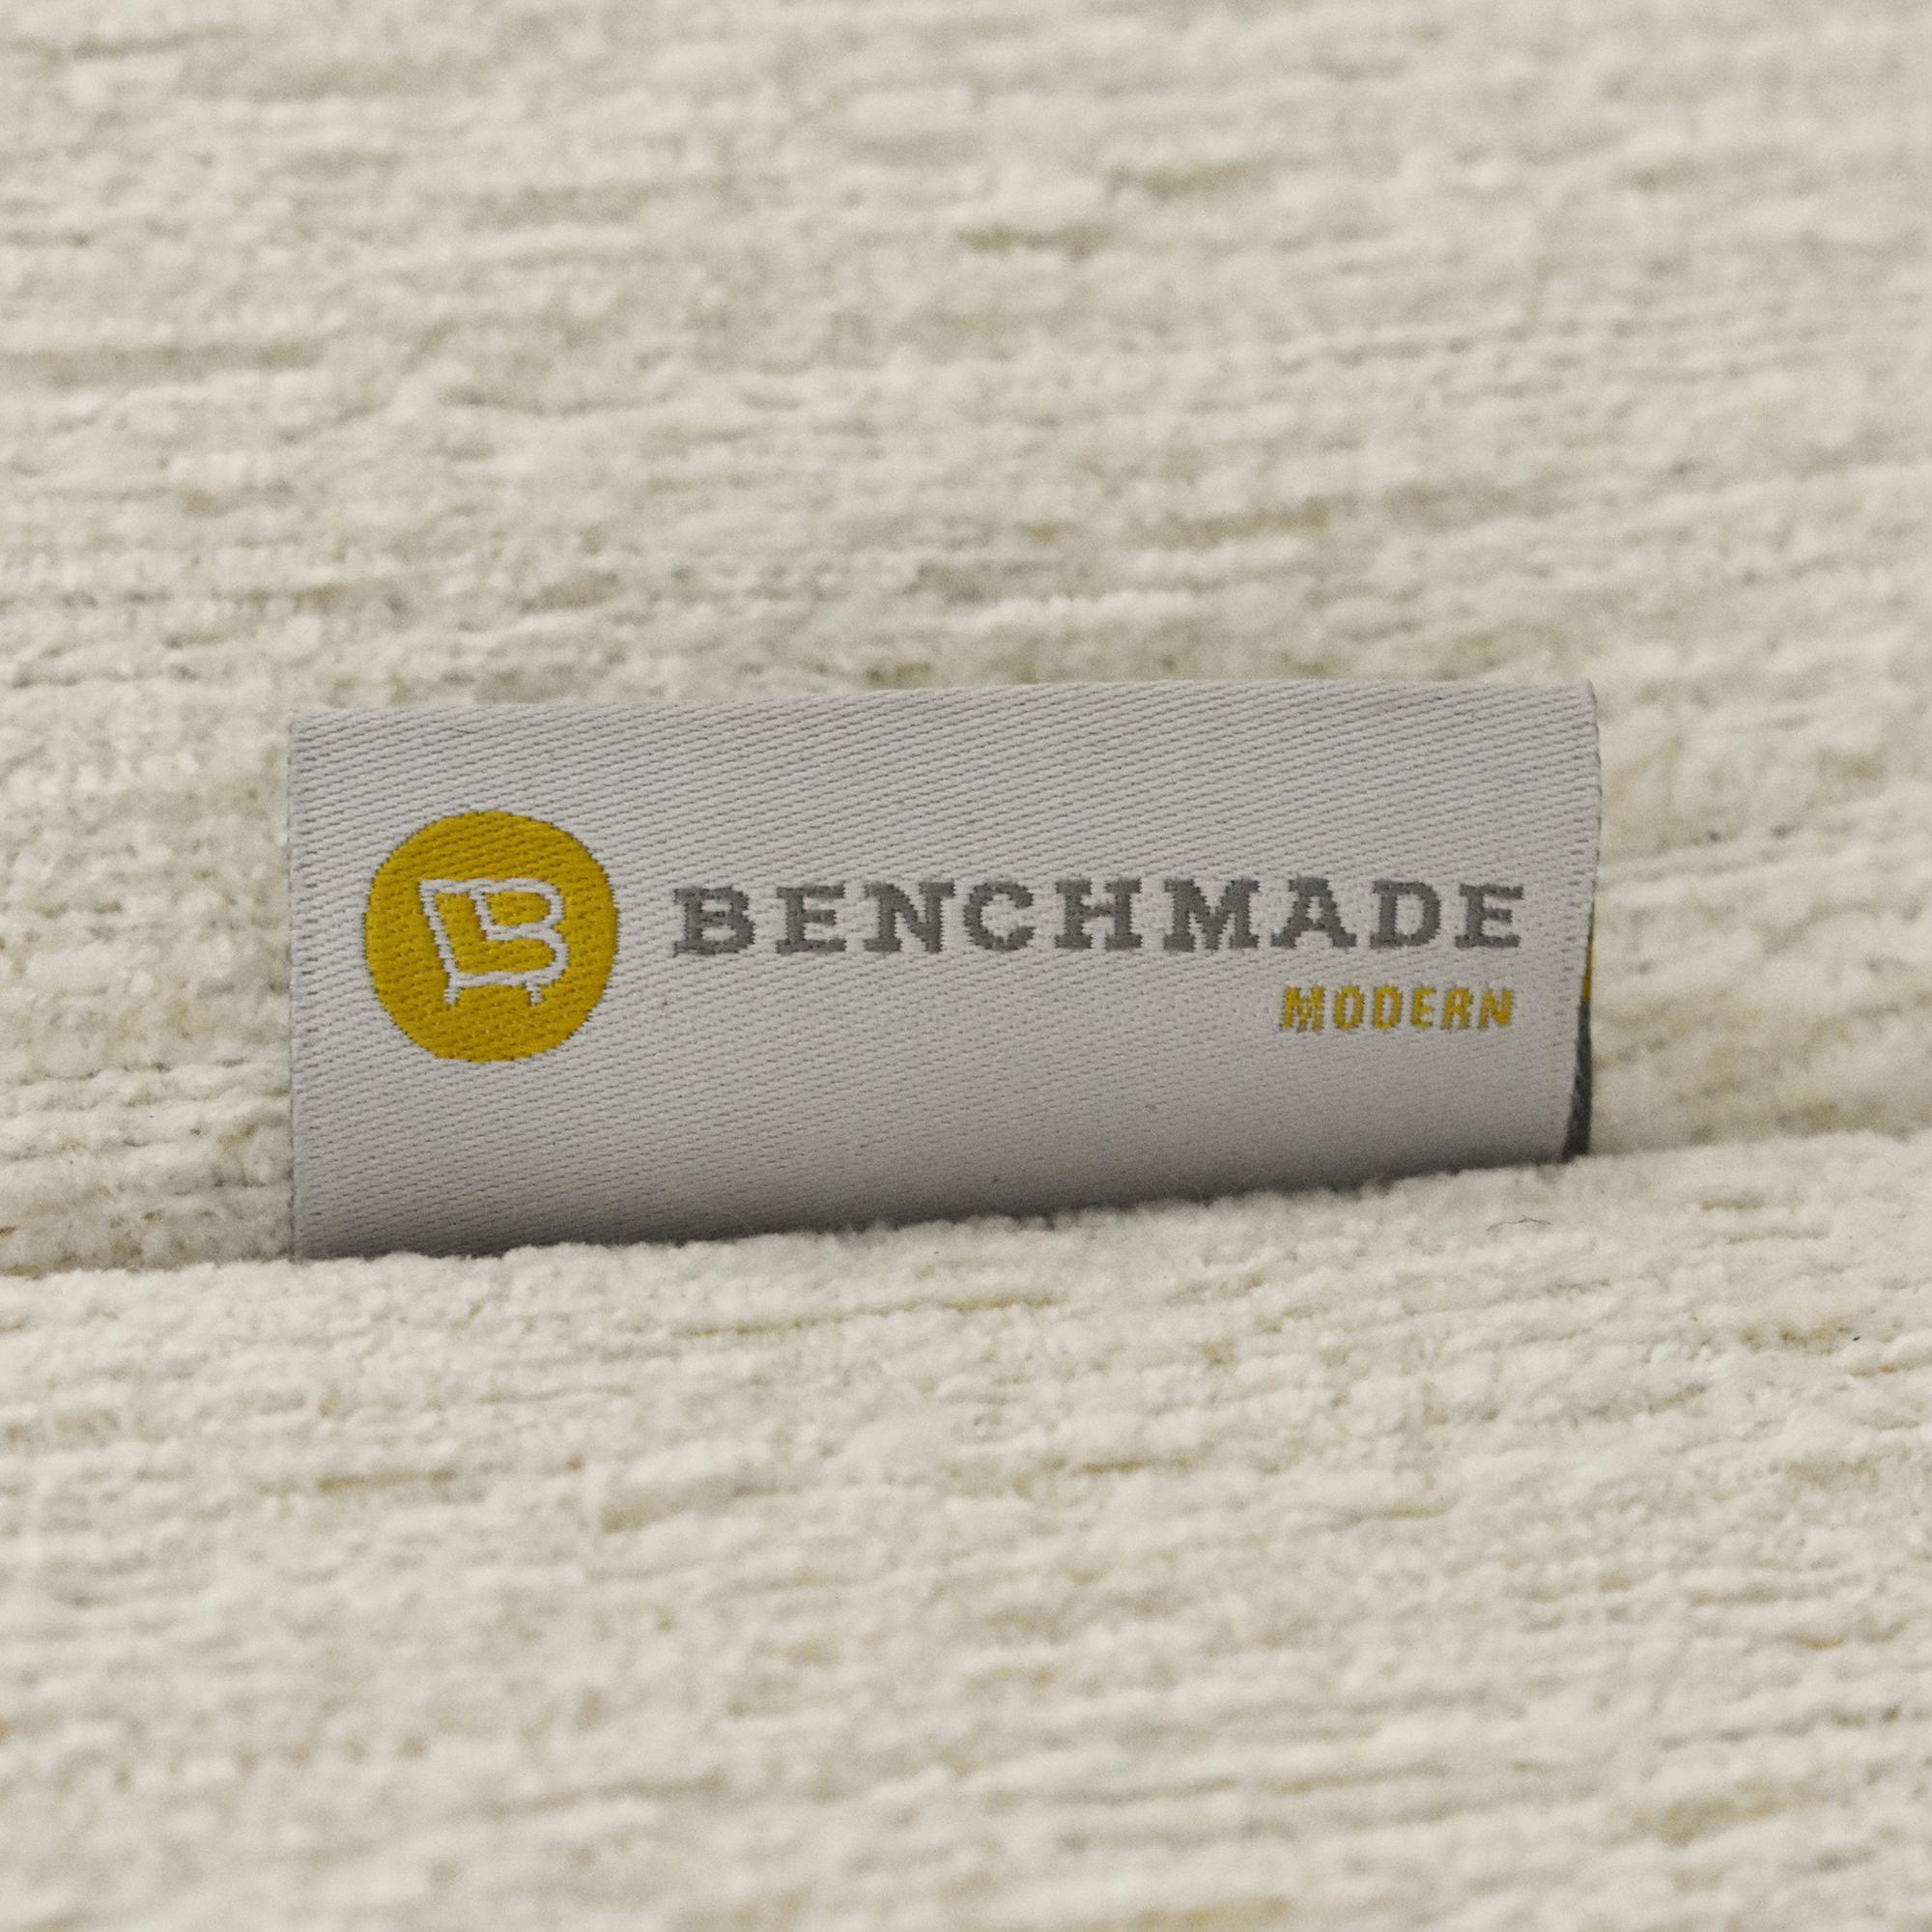 BenchMade Modern BenchMade Modern Couch Potato Sofa dimensions